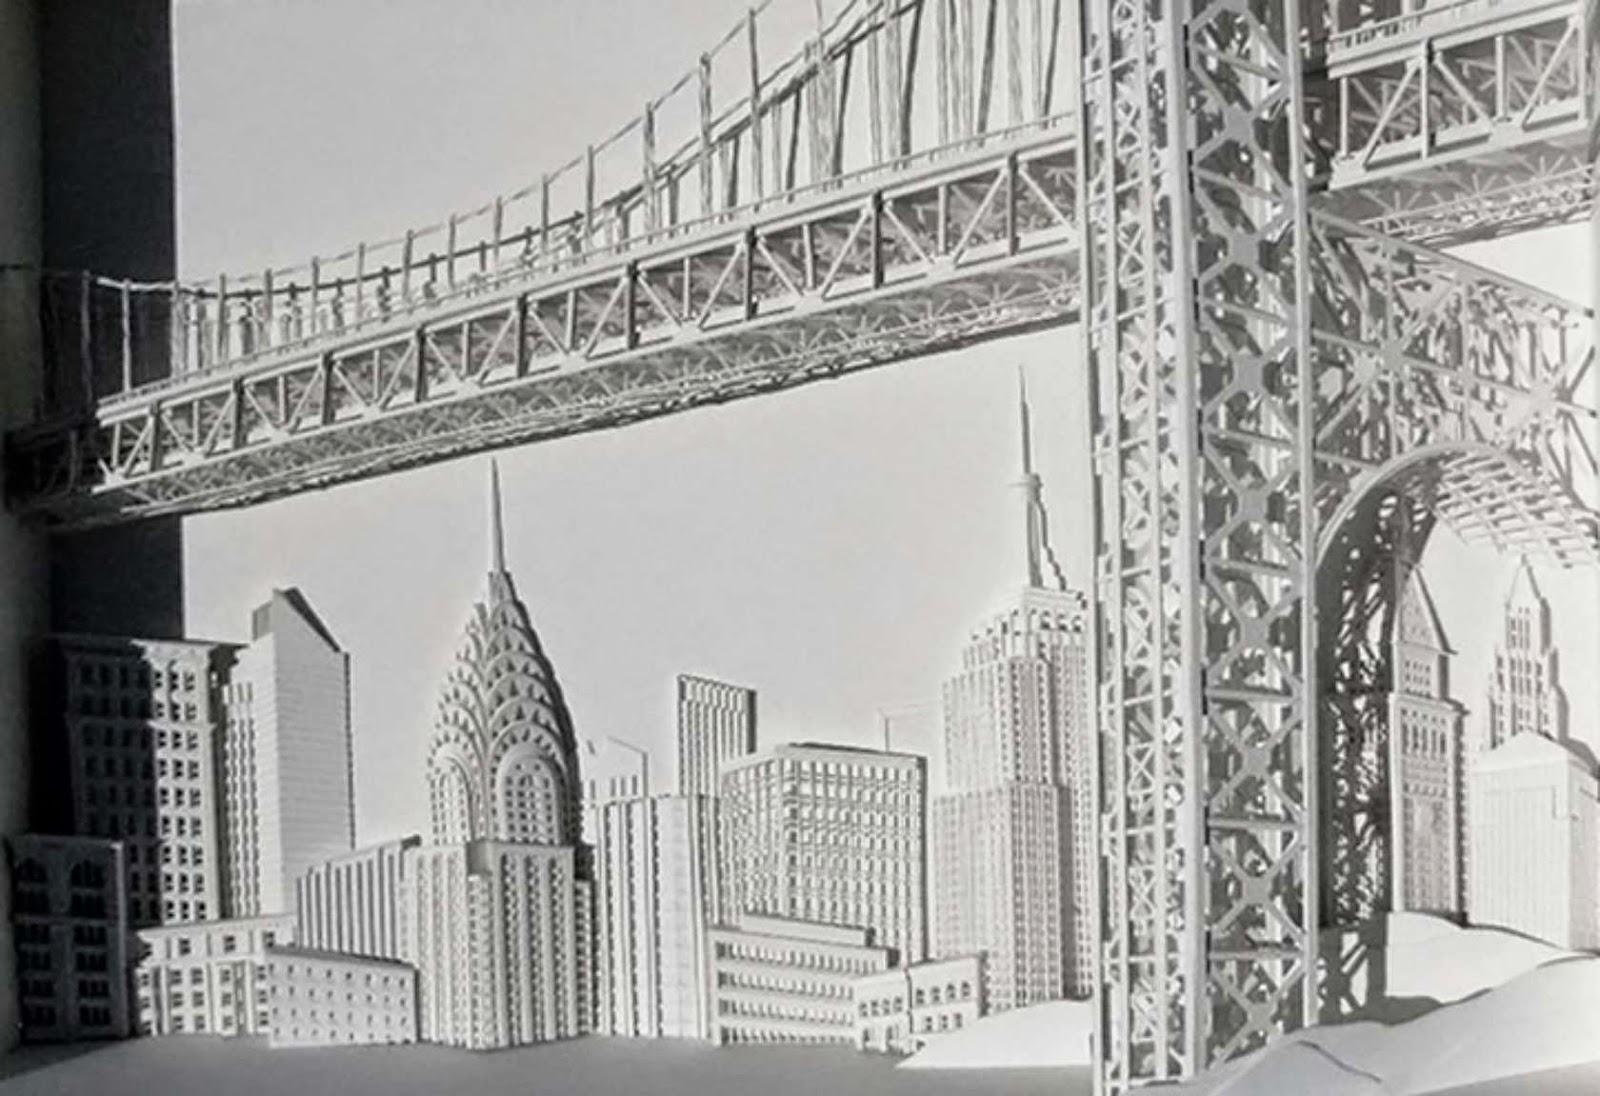 05-Christina-Lihan-3D-Architectural-Paper-Sculptures-www-designstack-co